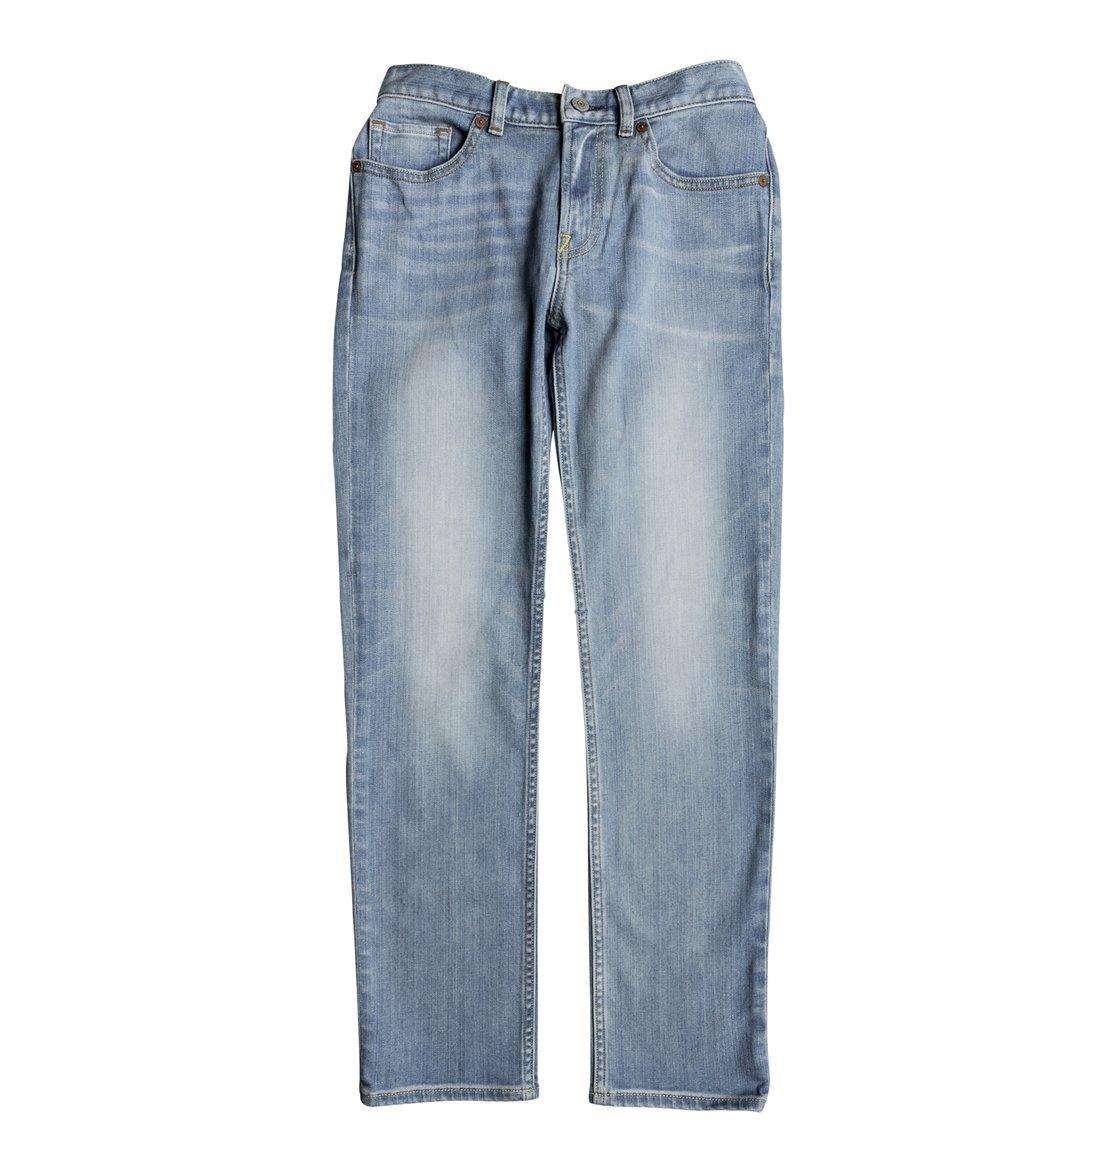 Dc Shoes Rechte Jeans »Worker Light Indigo Blue« - verschillende betaalmethodes